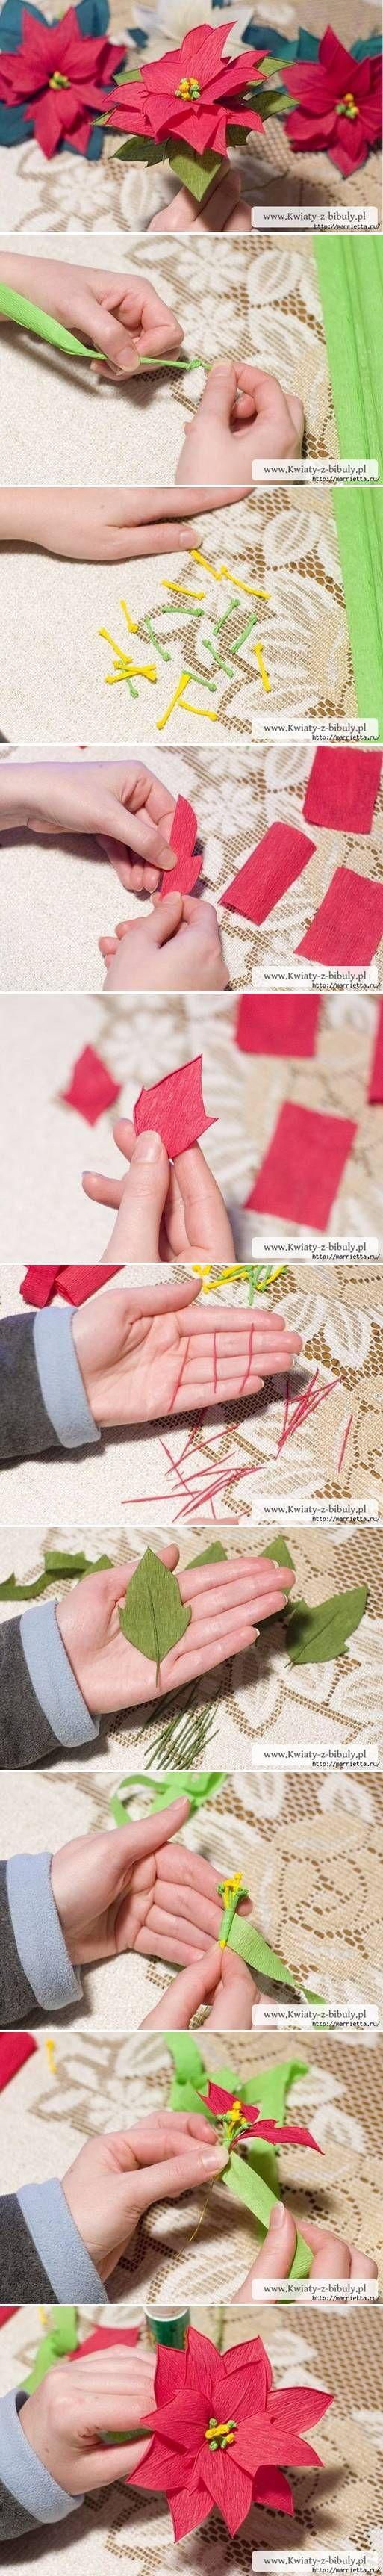 DIY Crepe Paper Poinsettia